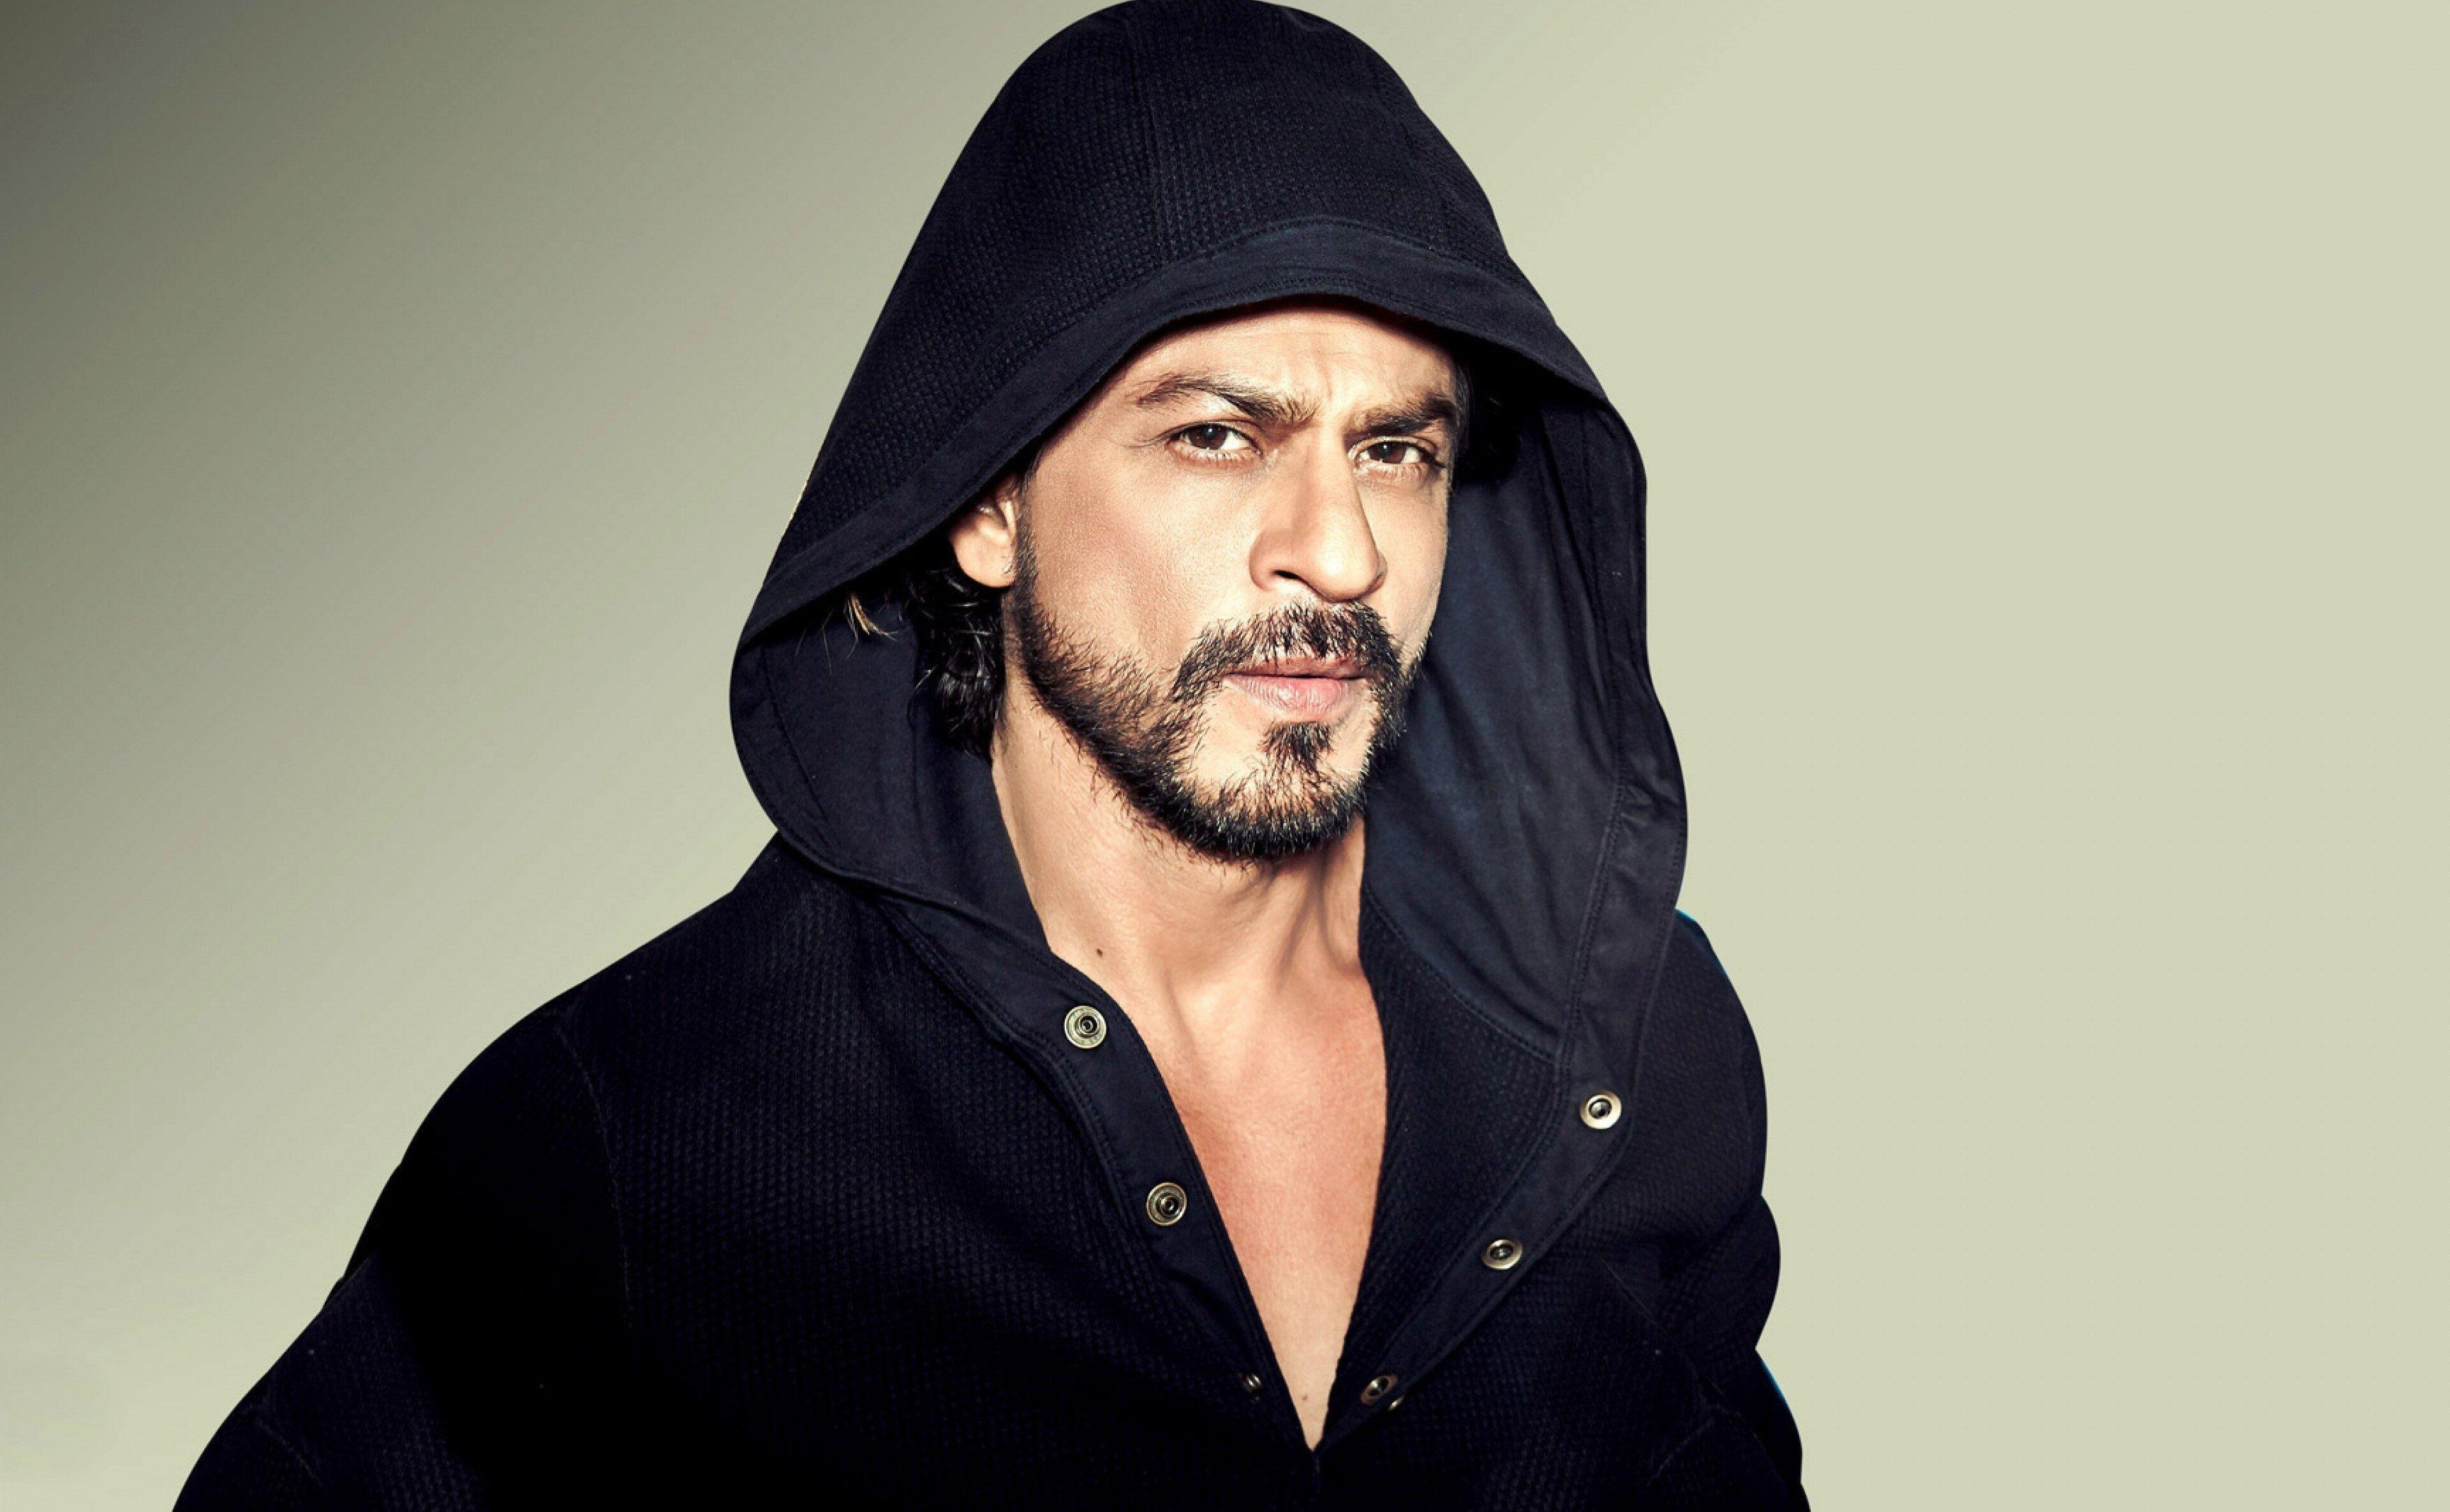 3840x2370 shahrukh khan 4k wallpaper for hd desktop | Shahrukh khan, Indian  celebrities, Bollywood